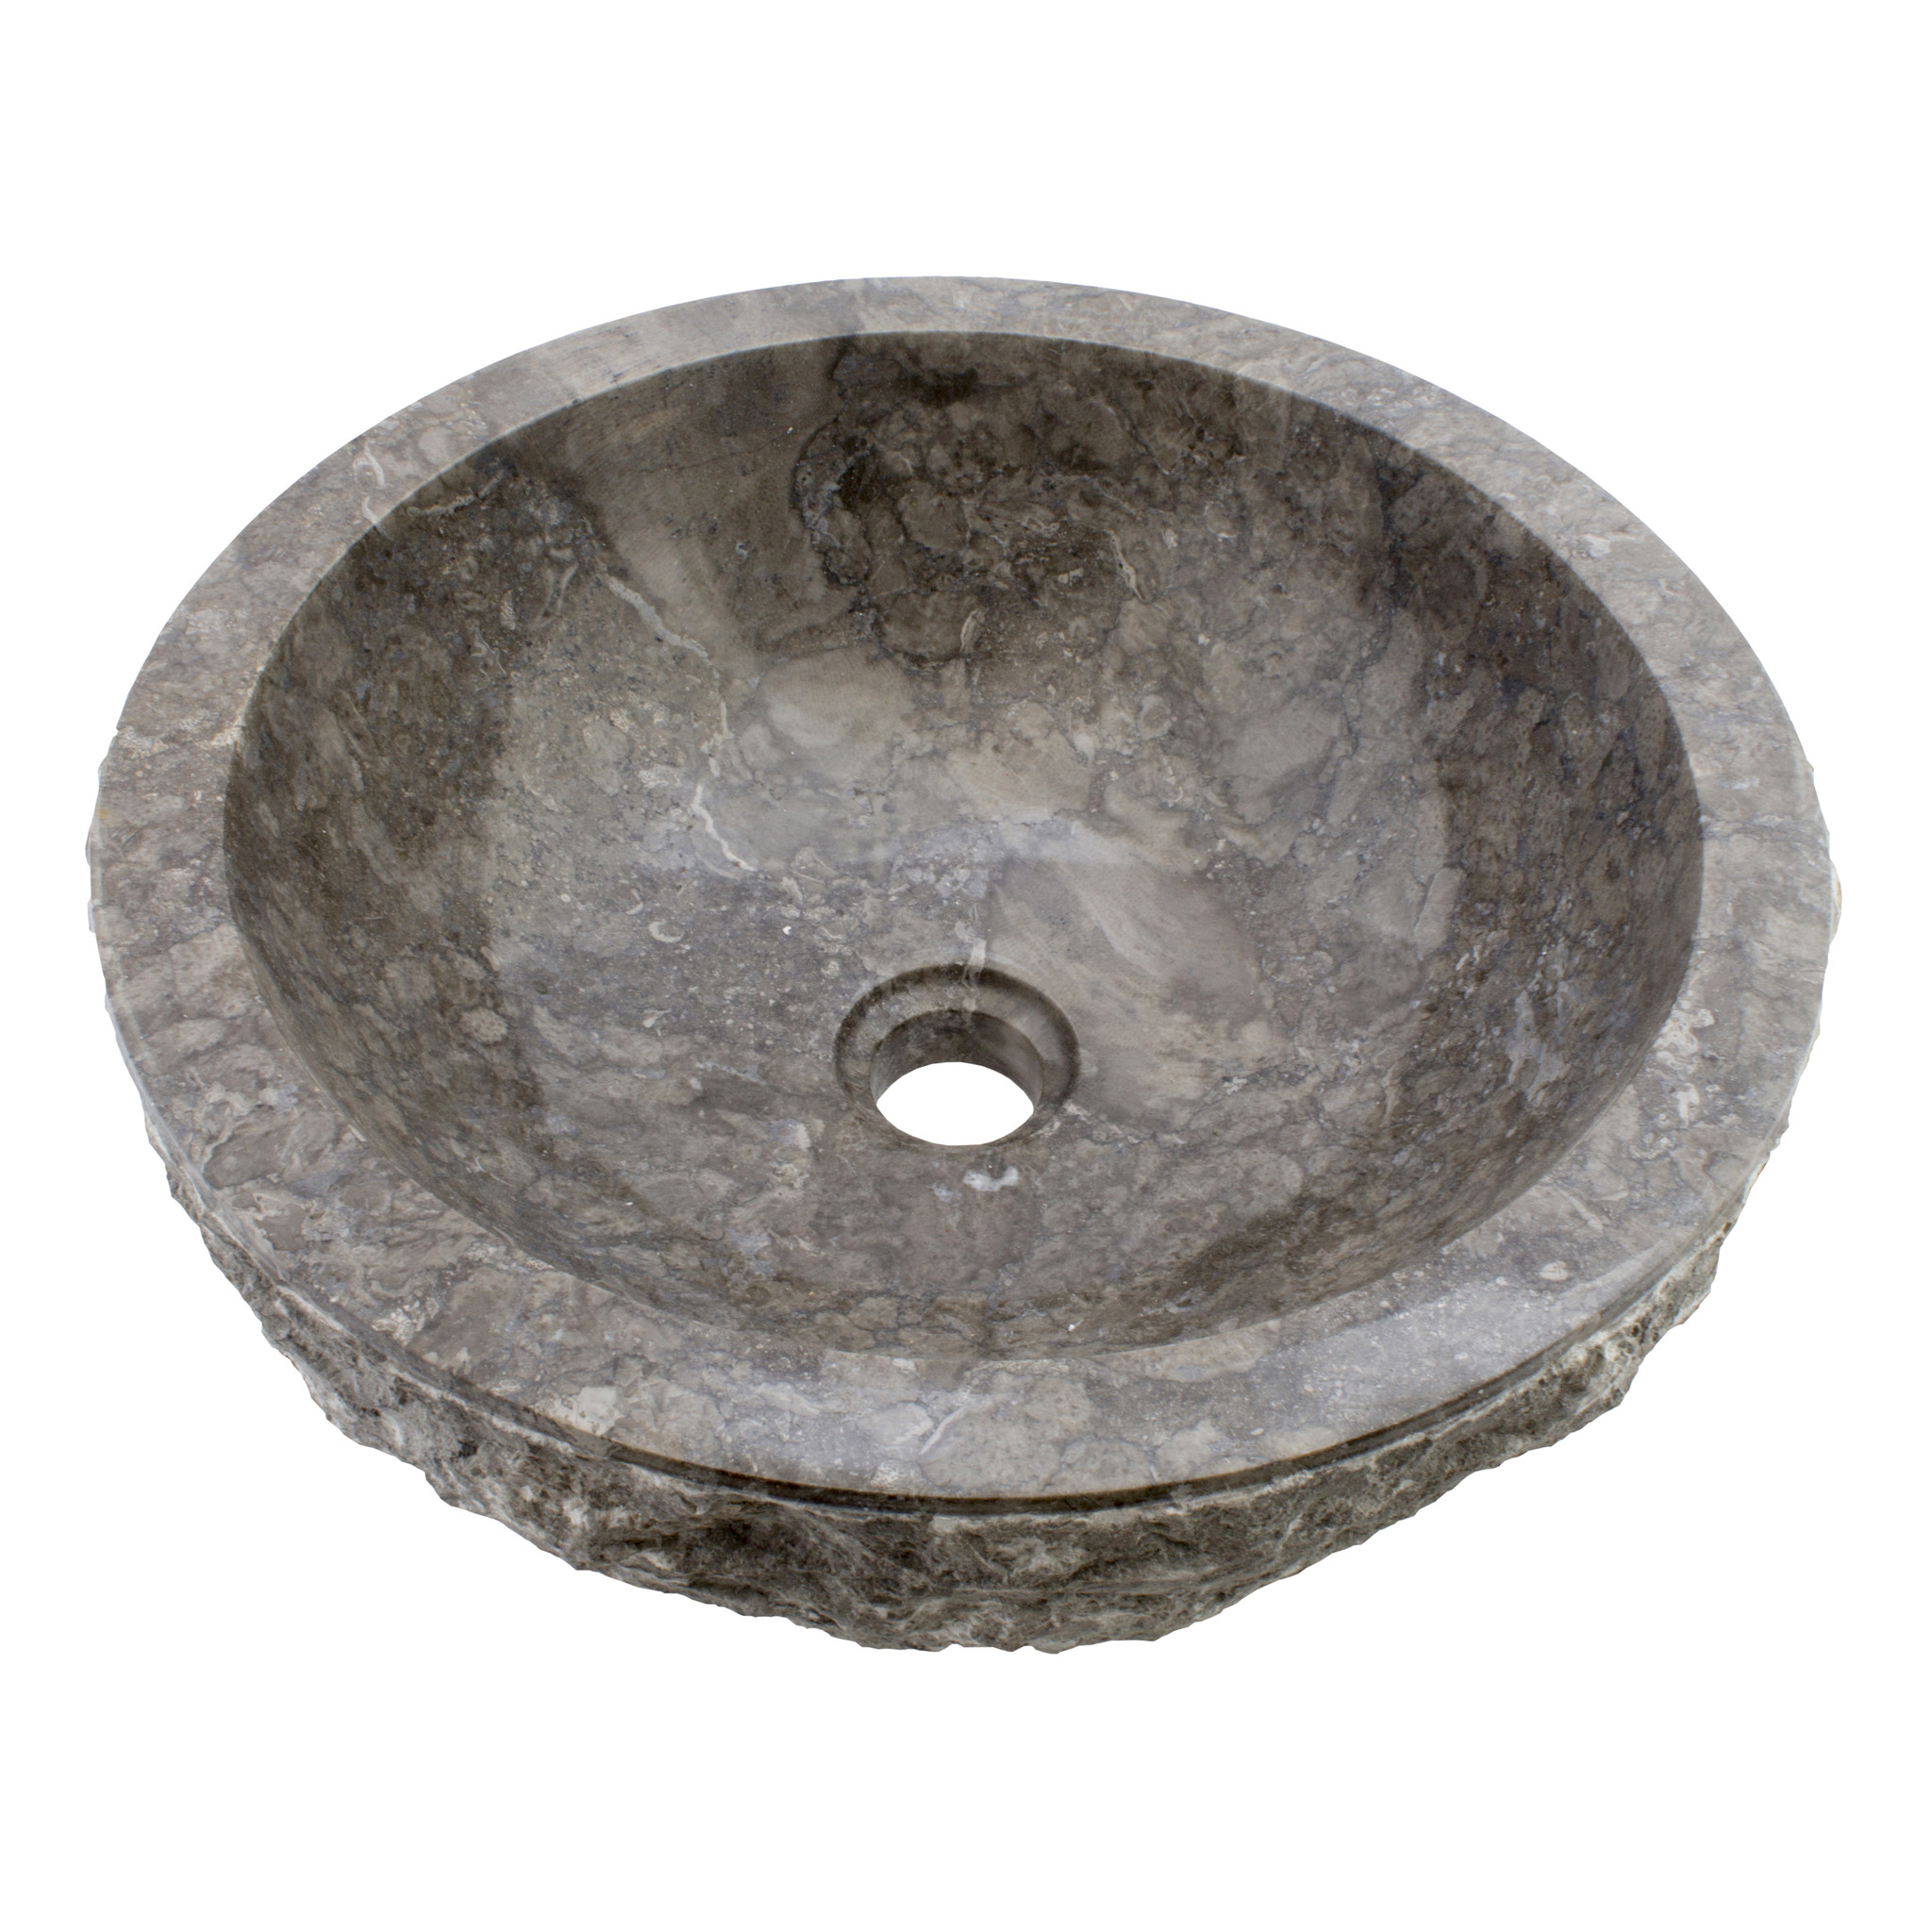 Indomarmer Gray Marble Wash bowl Full-Marmo Ø 40 x H 15 cm